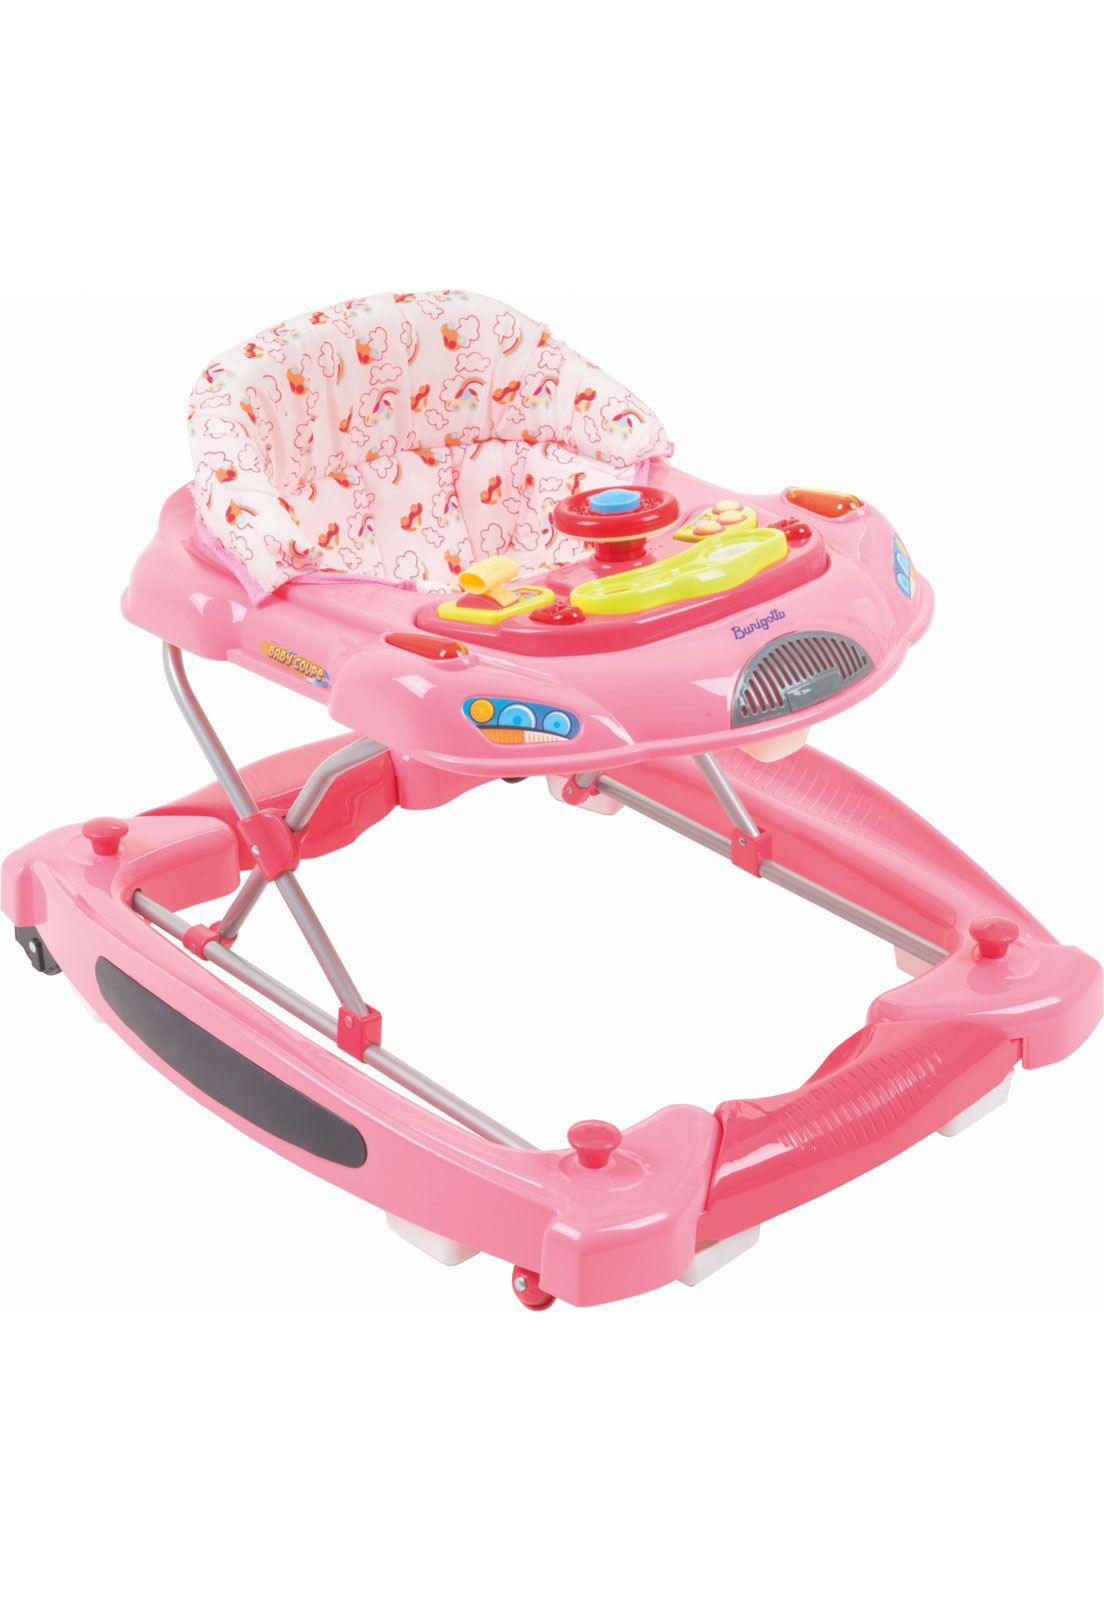 Andador Baby Coupe Rosa - Burigotto Ref 3034